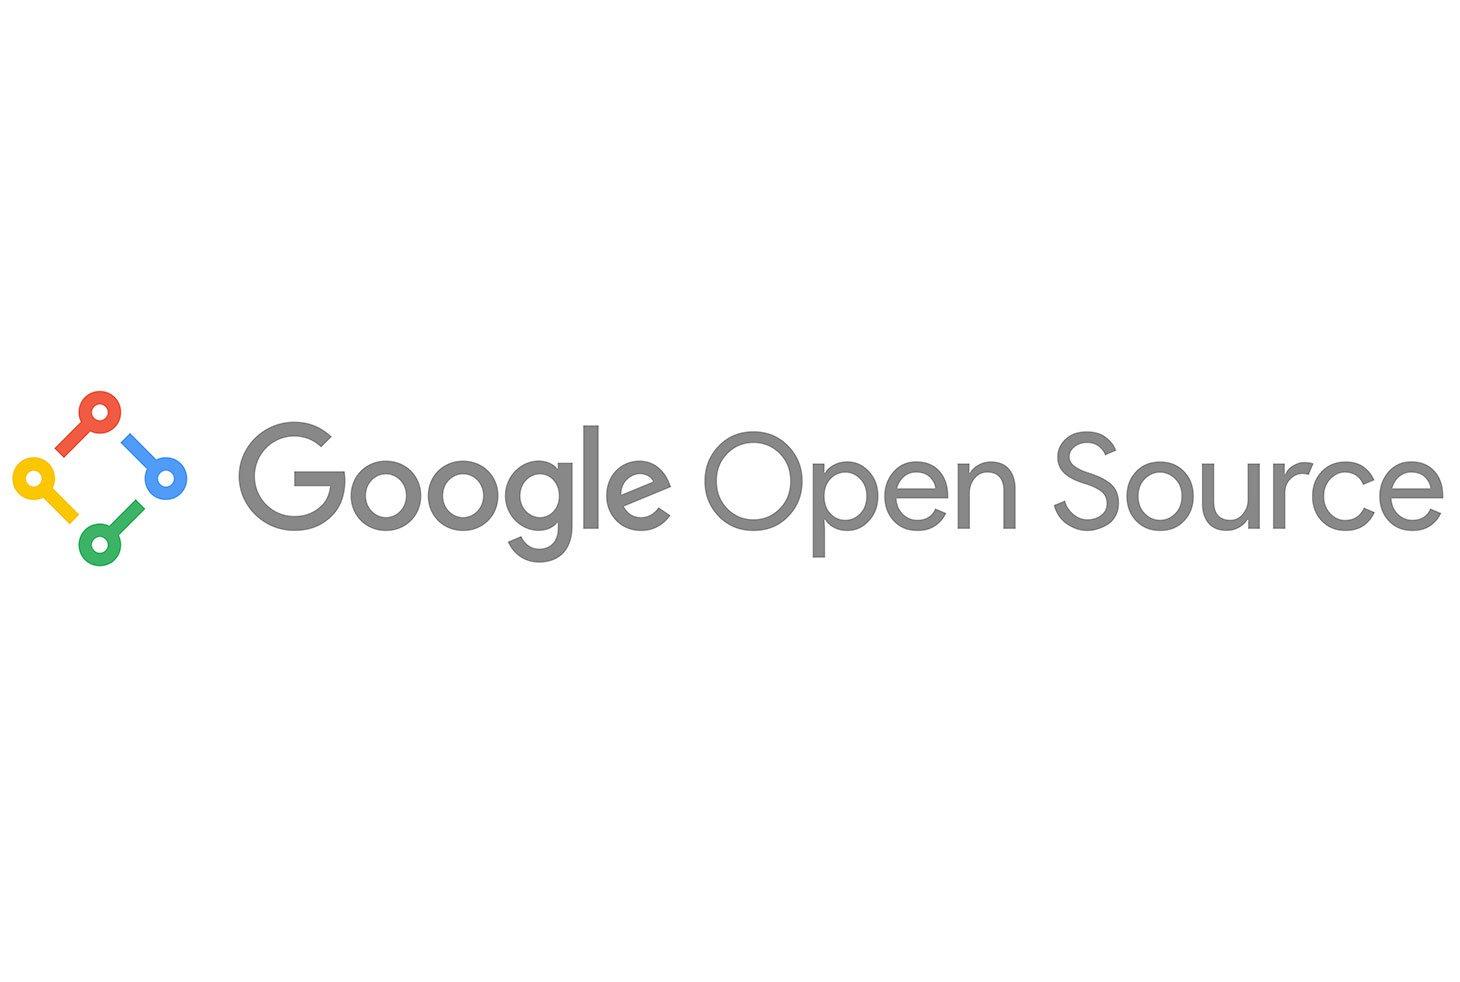 google-open-source-rectangle-logo2.jpg